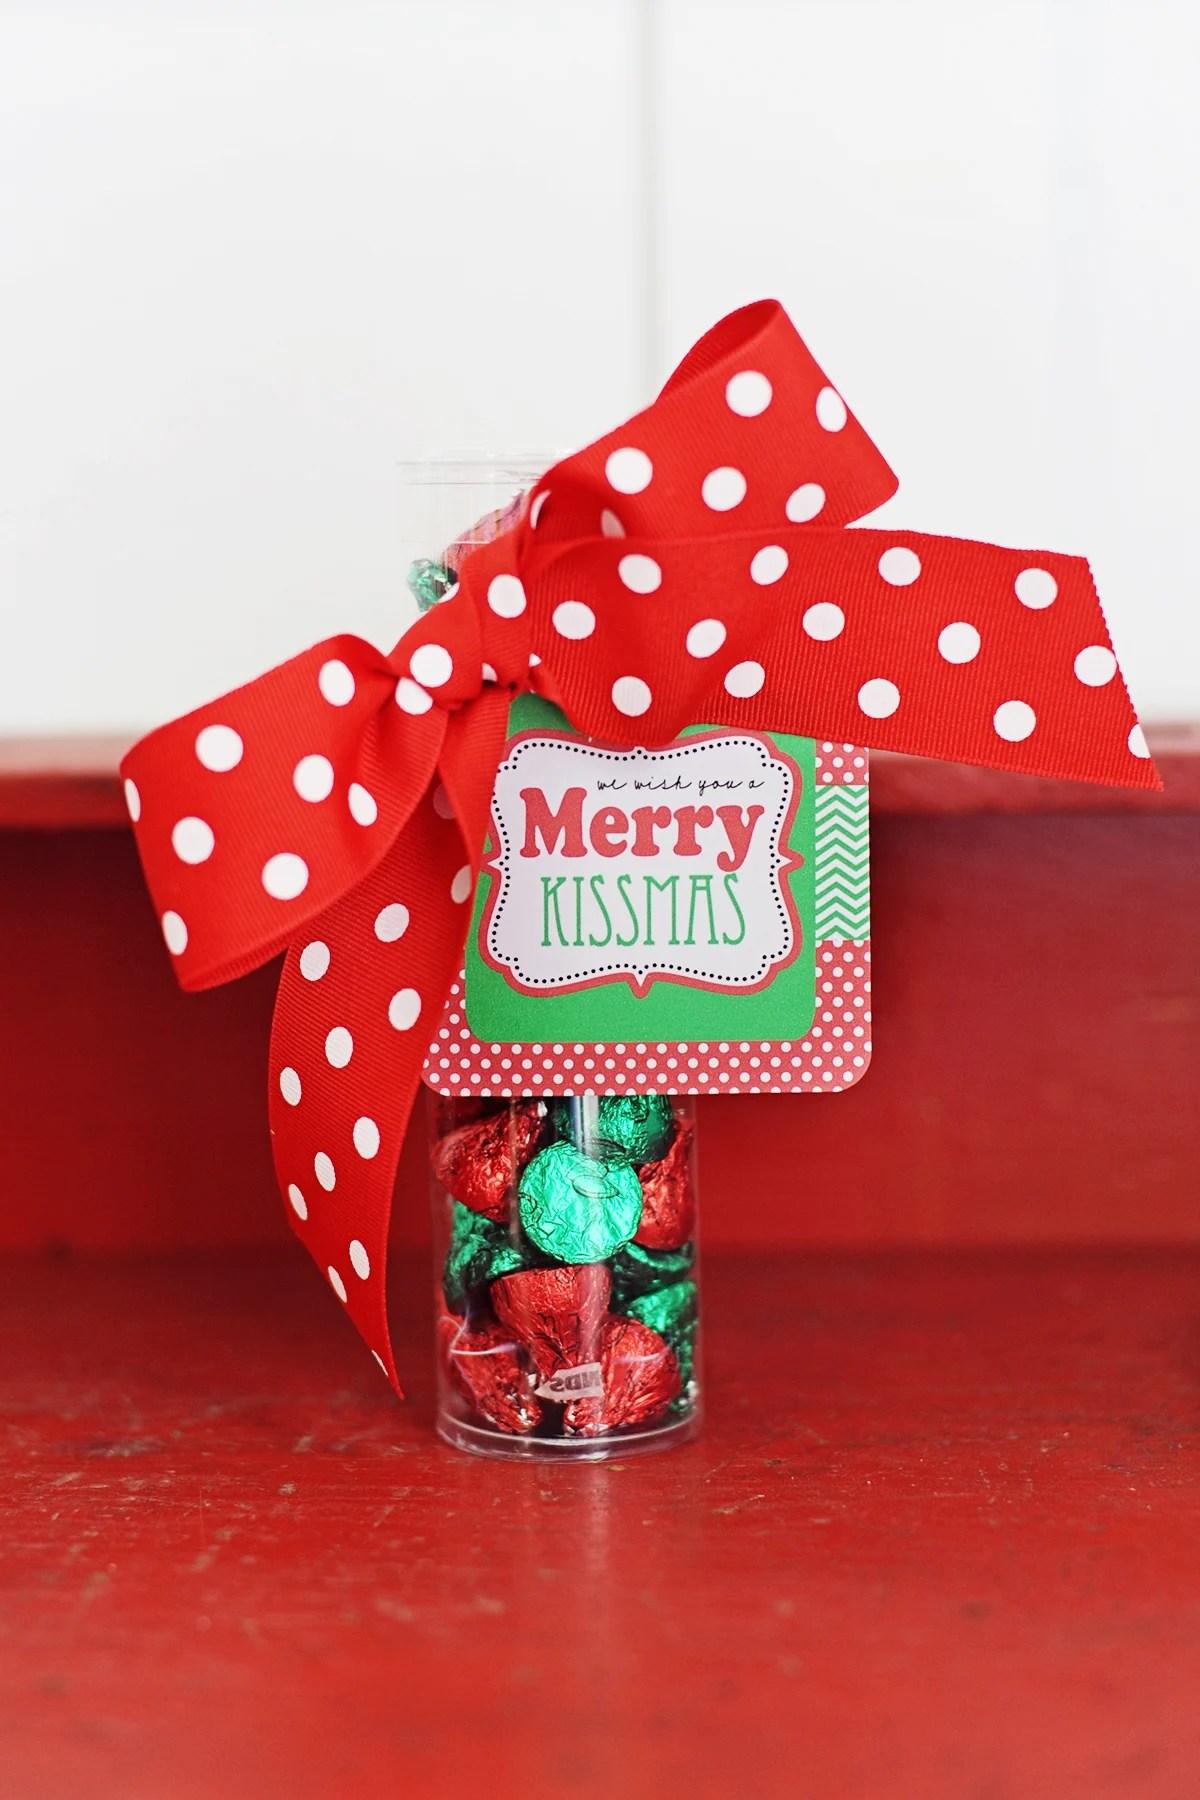 Merry kissmas free printable tags